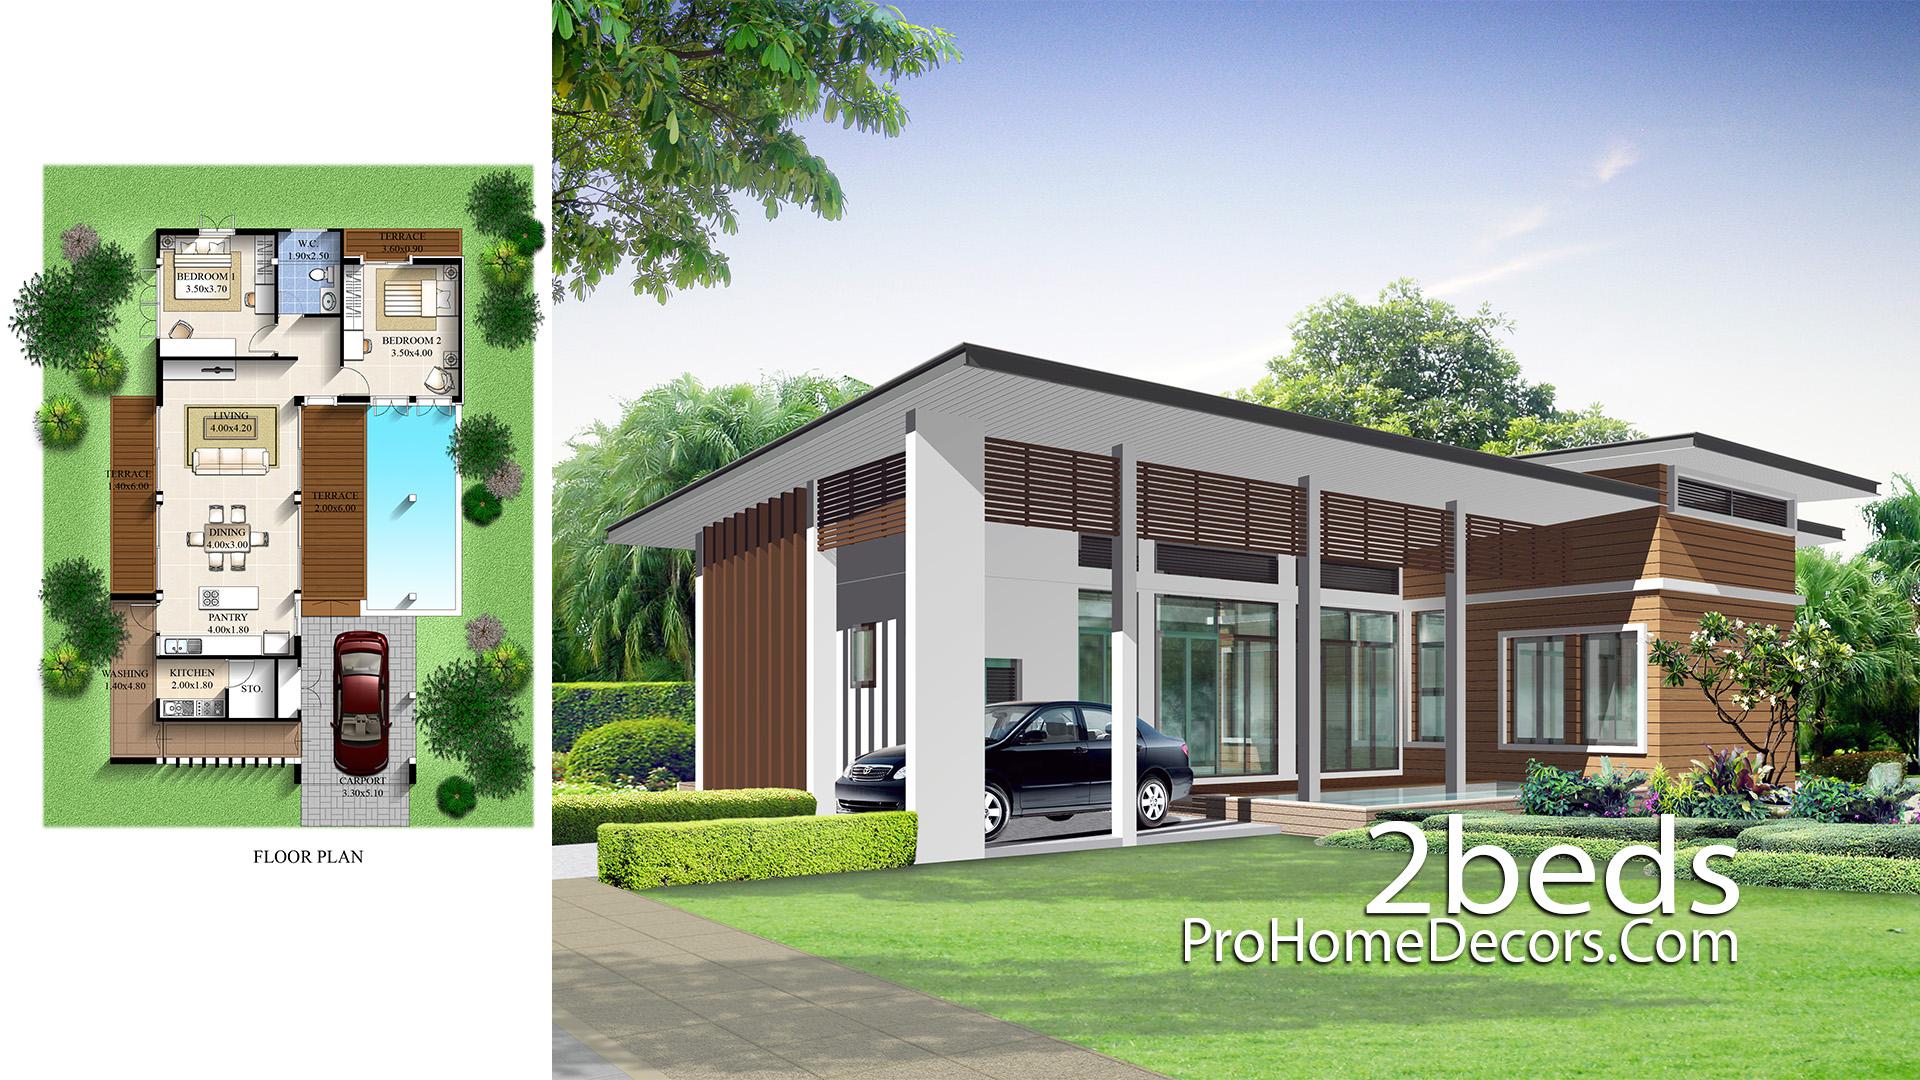 House Design Plan 10.5x16 meter with 2 Bedrooms